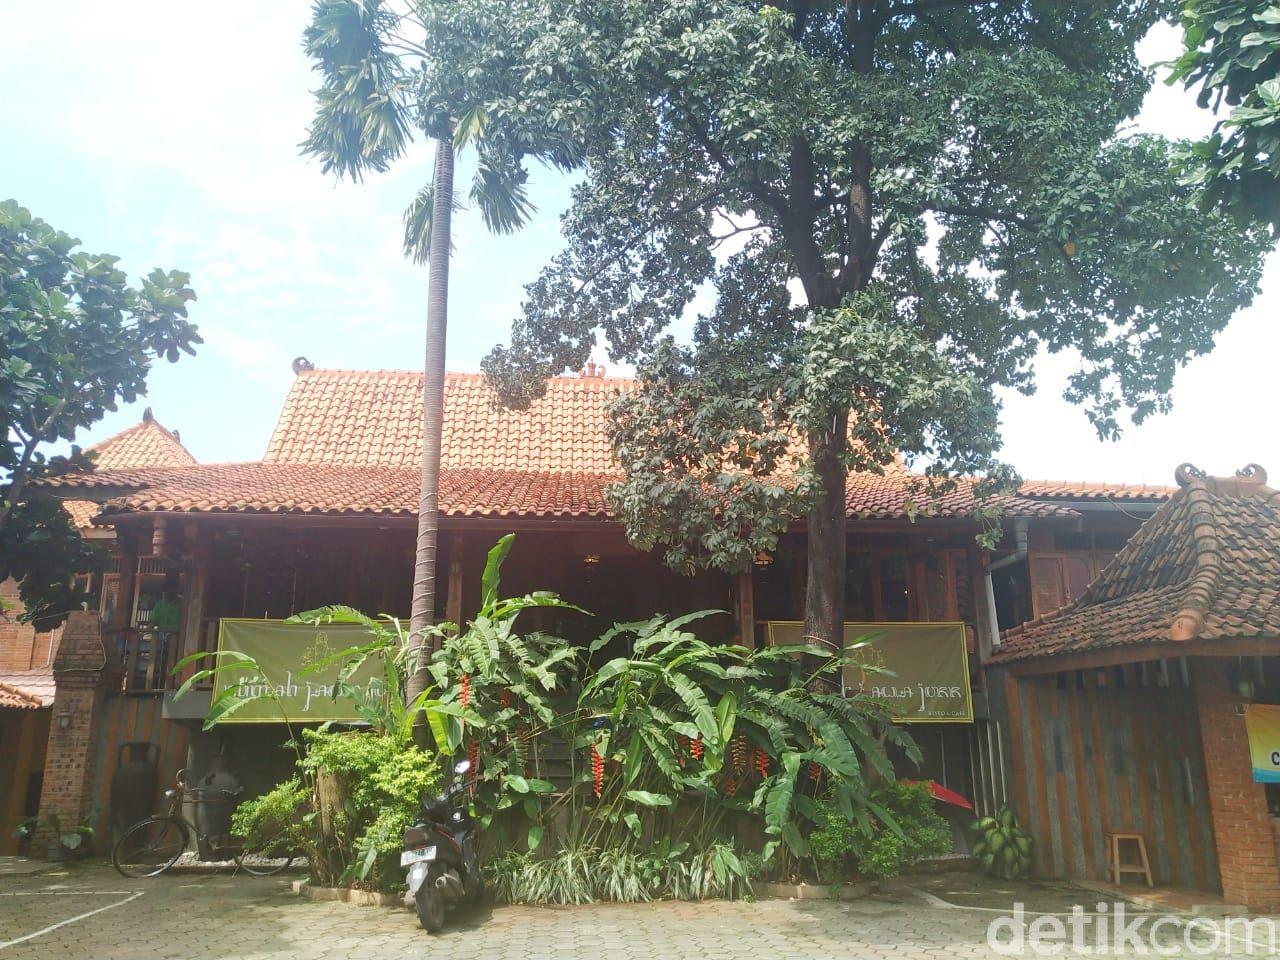 Rumah Jawa : Asem-asem Iga dan Nasi Gudeg Mlekoh Pengobat Kangen